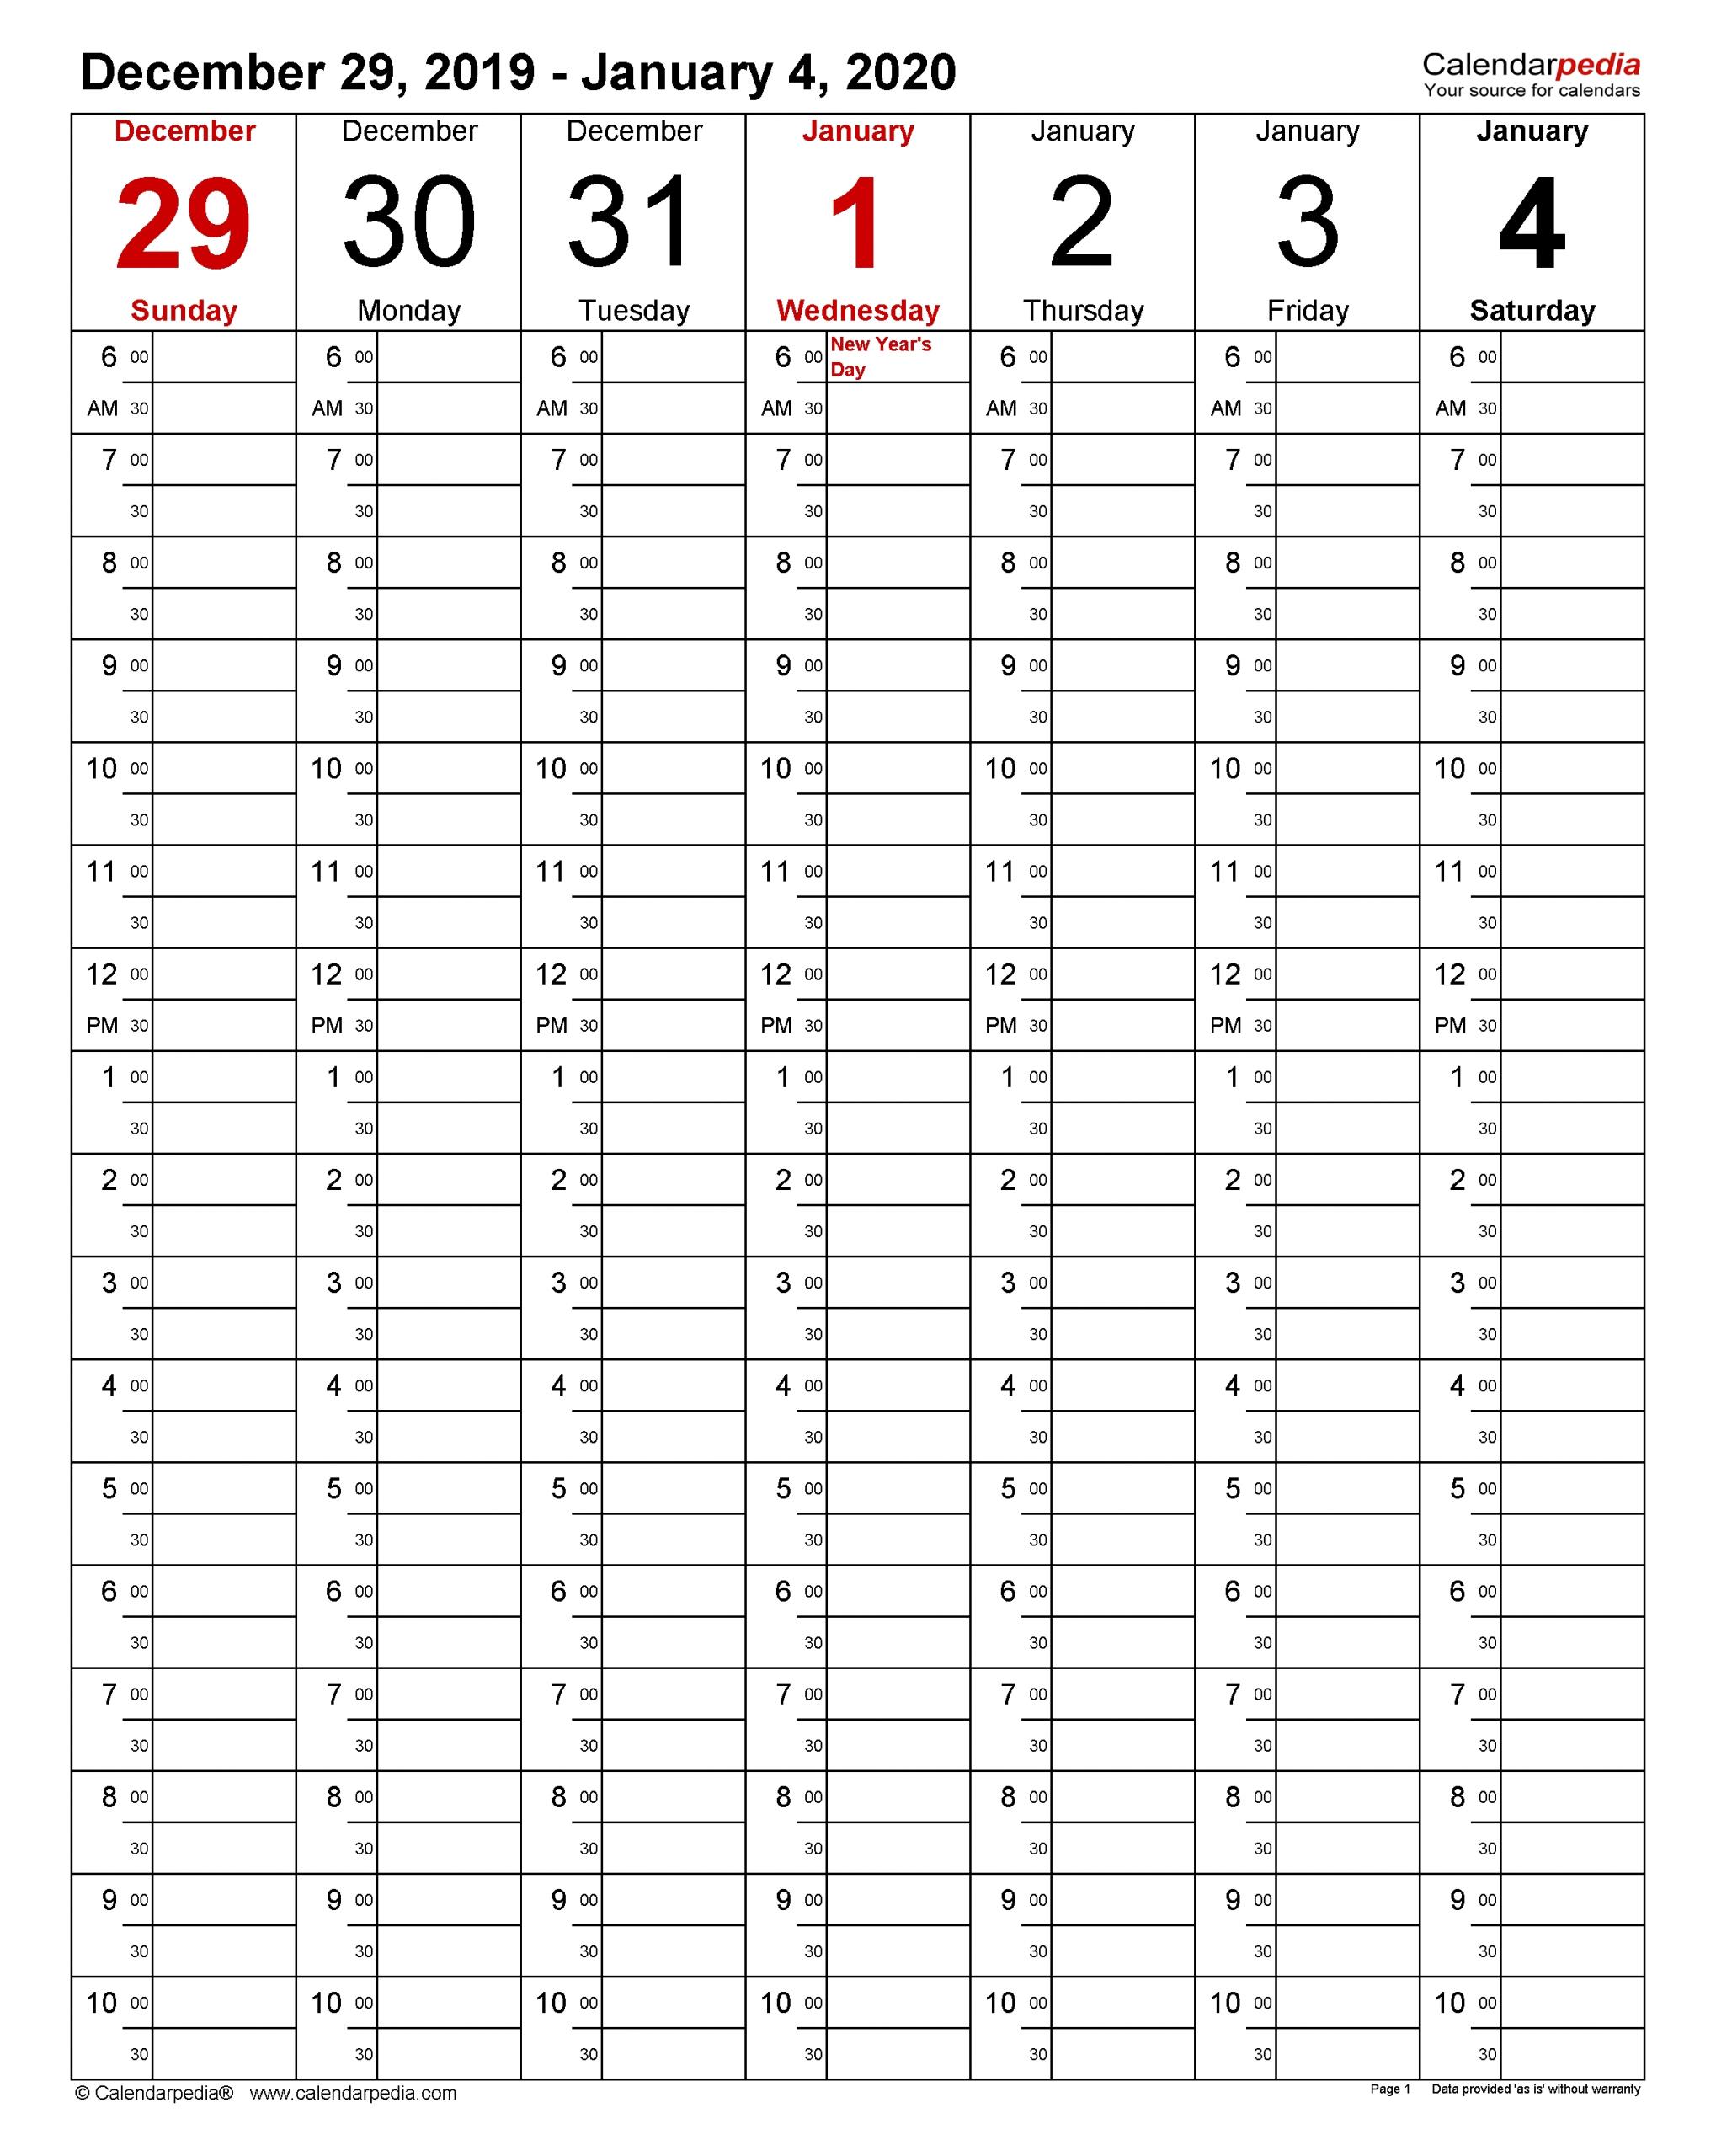 Weekly Calendars 2020 For Pdf - 12 Free Printable Templates inside Free Printable Calendars With Time Slots